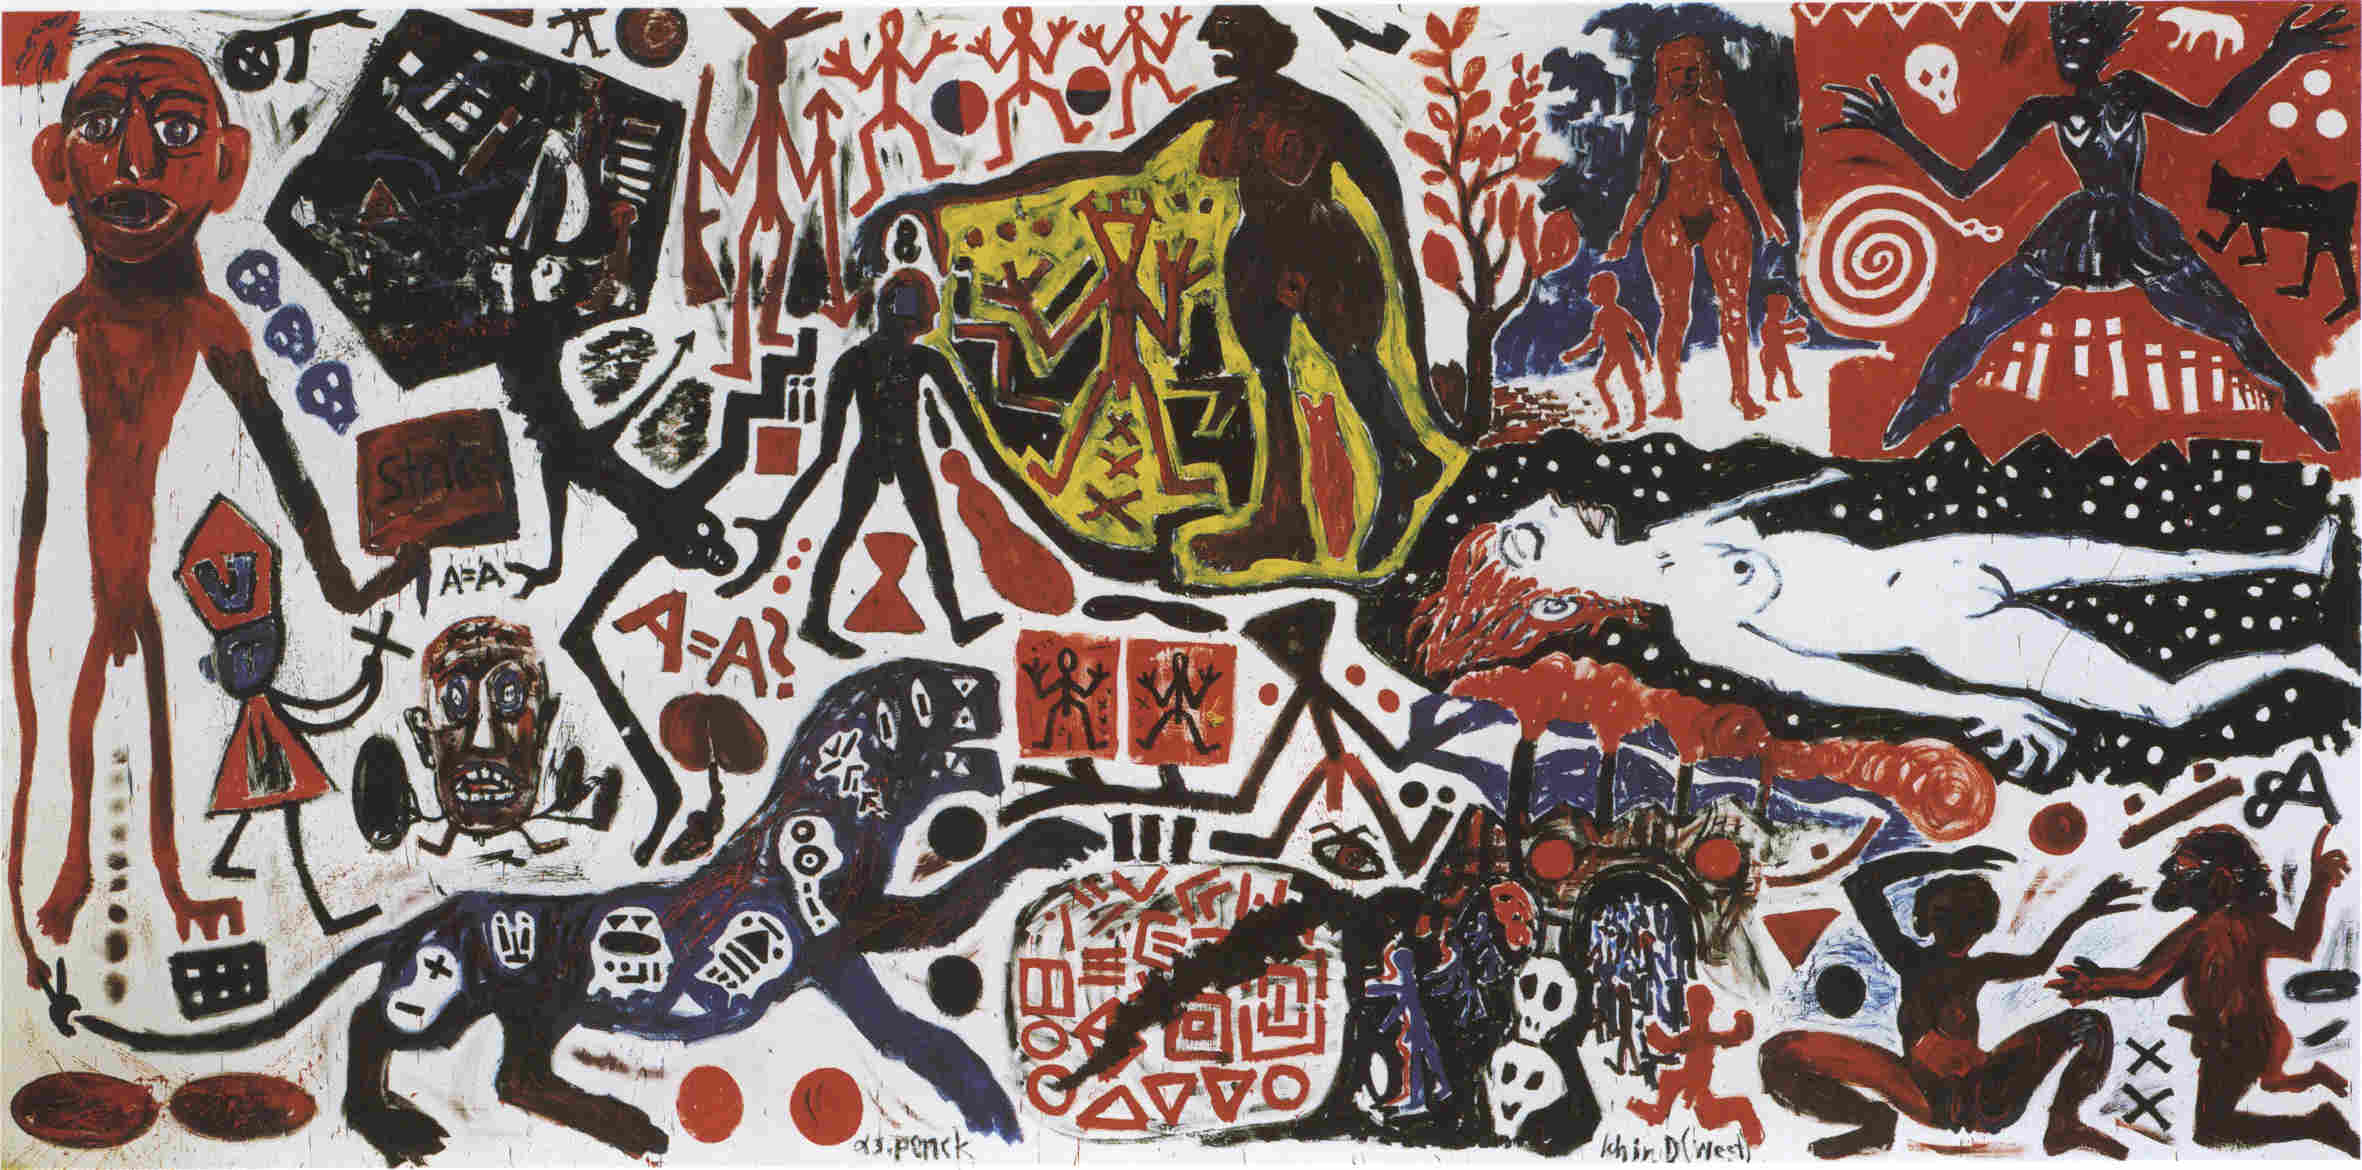 #happybirthday (Ralf Winkler) A.R. Penck (born 5 Oct 1939) is a German #painter, printmaker, #sculptor, and jazz drummer. #art #artist